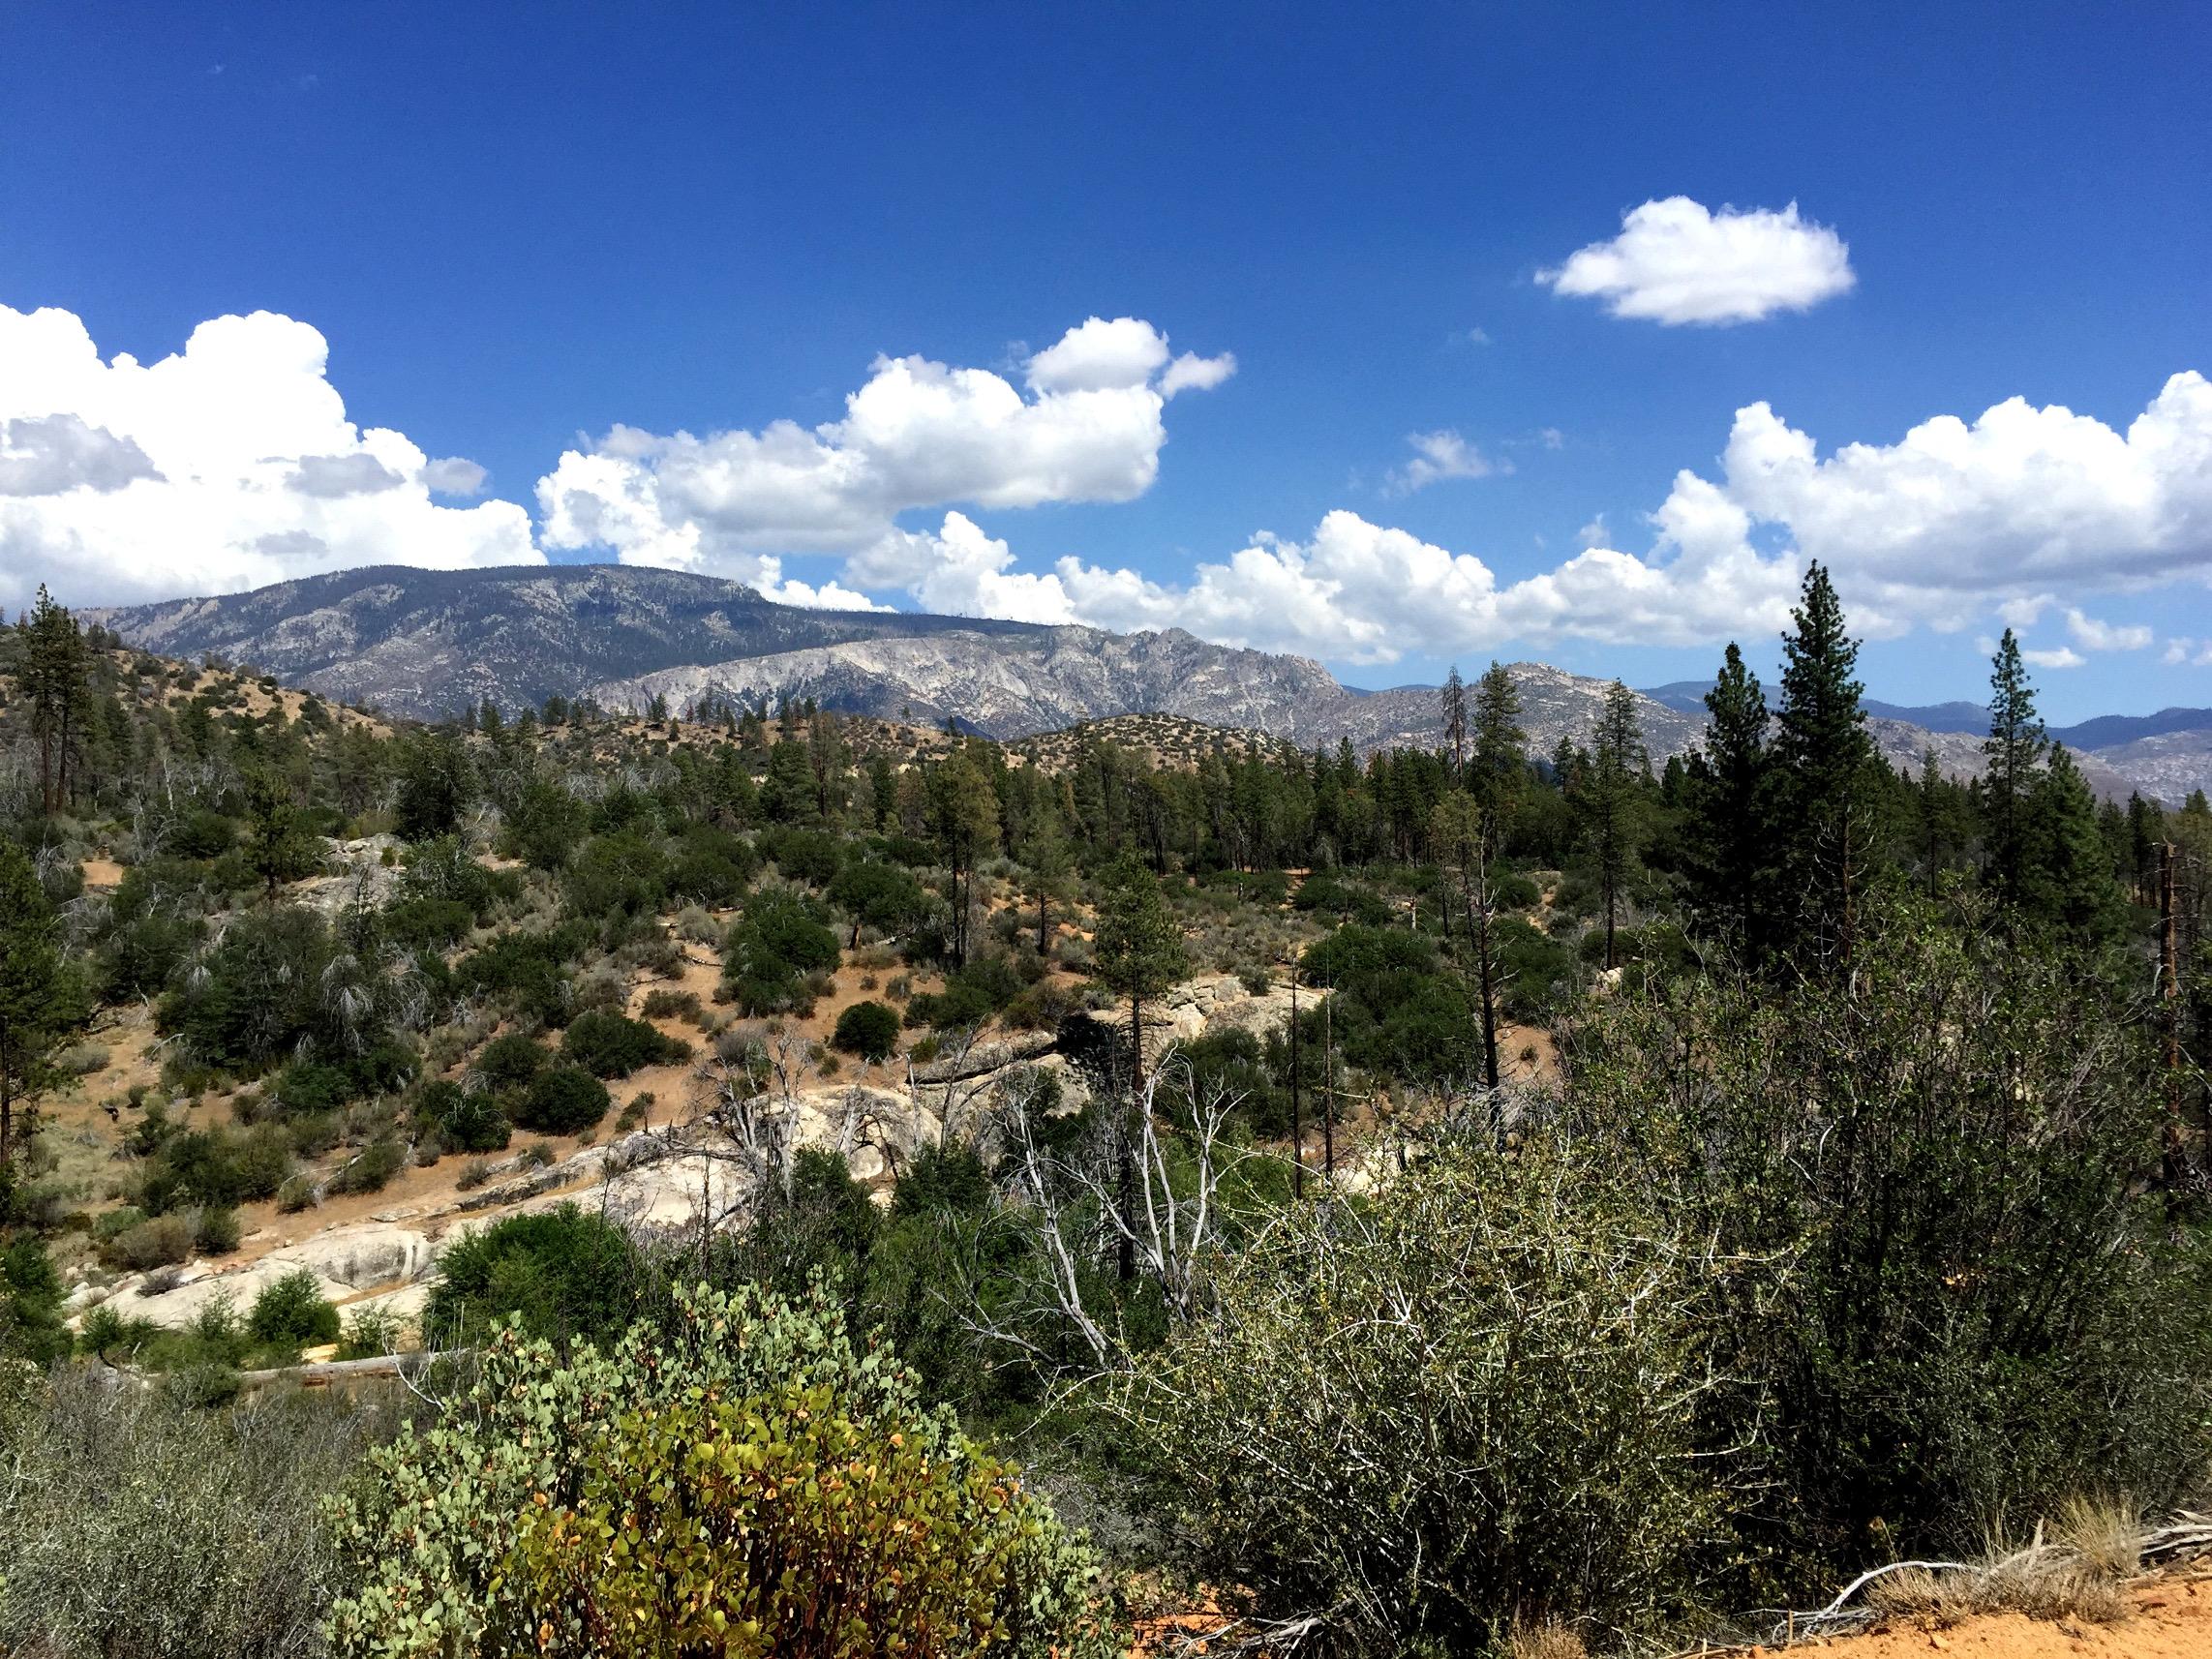 Kernville, Hike, Rant, Trash, Litter, Adventure, Travel, California, Mountains